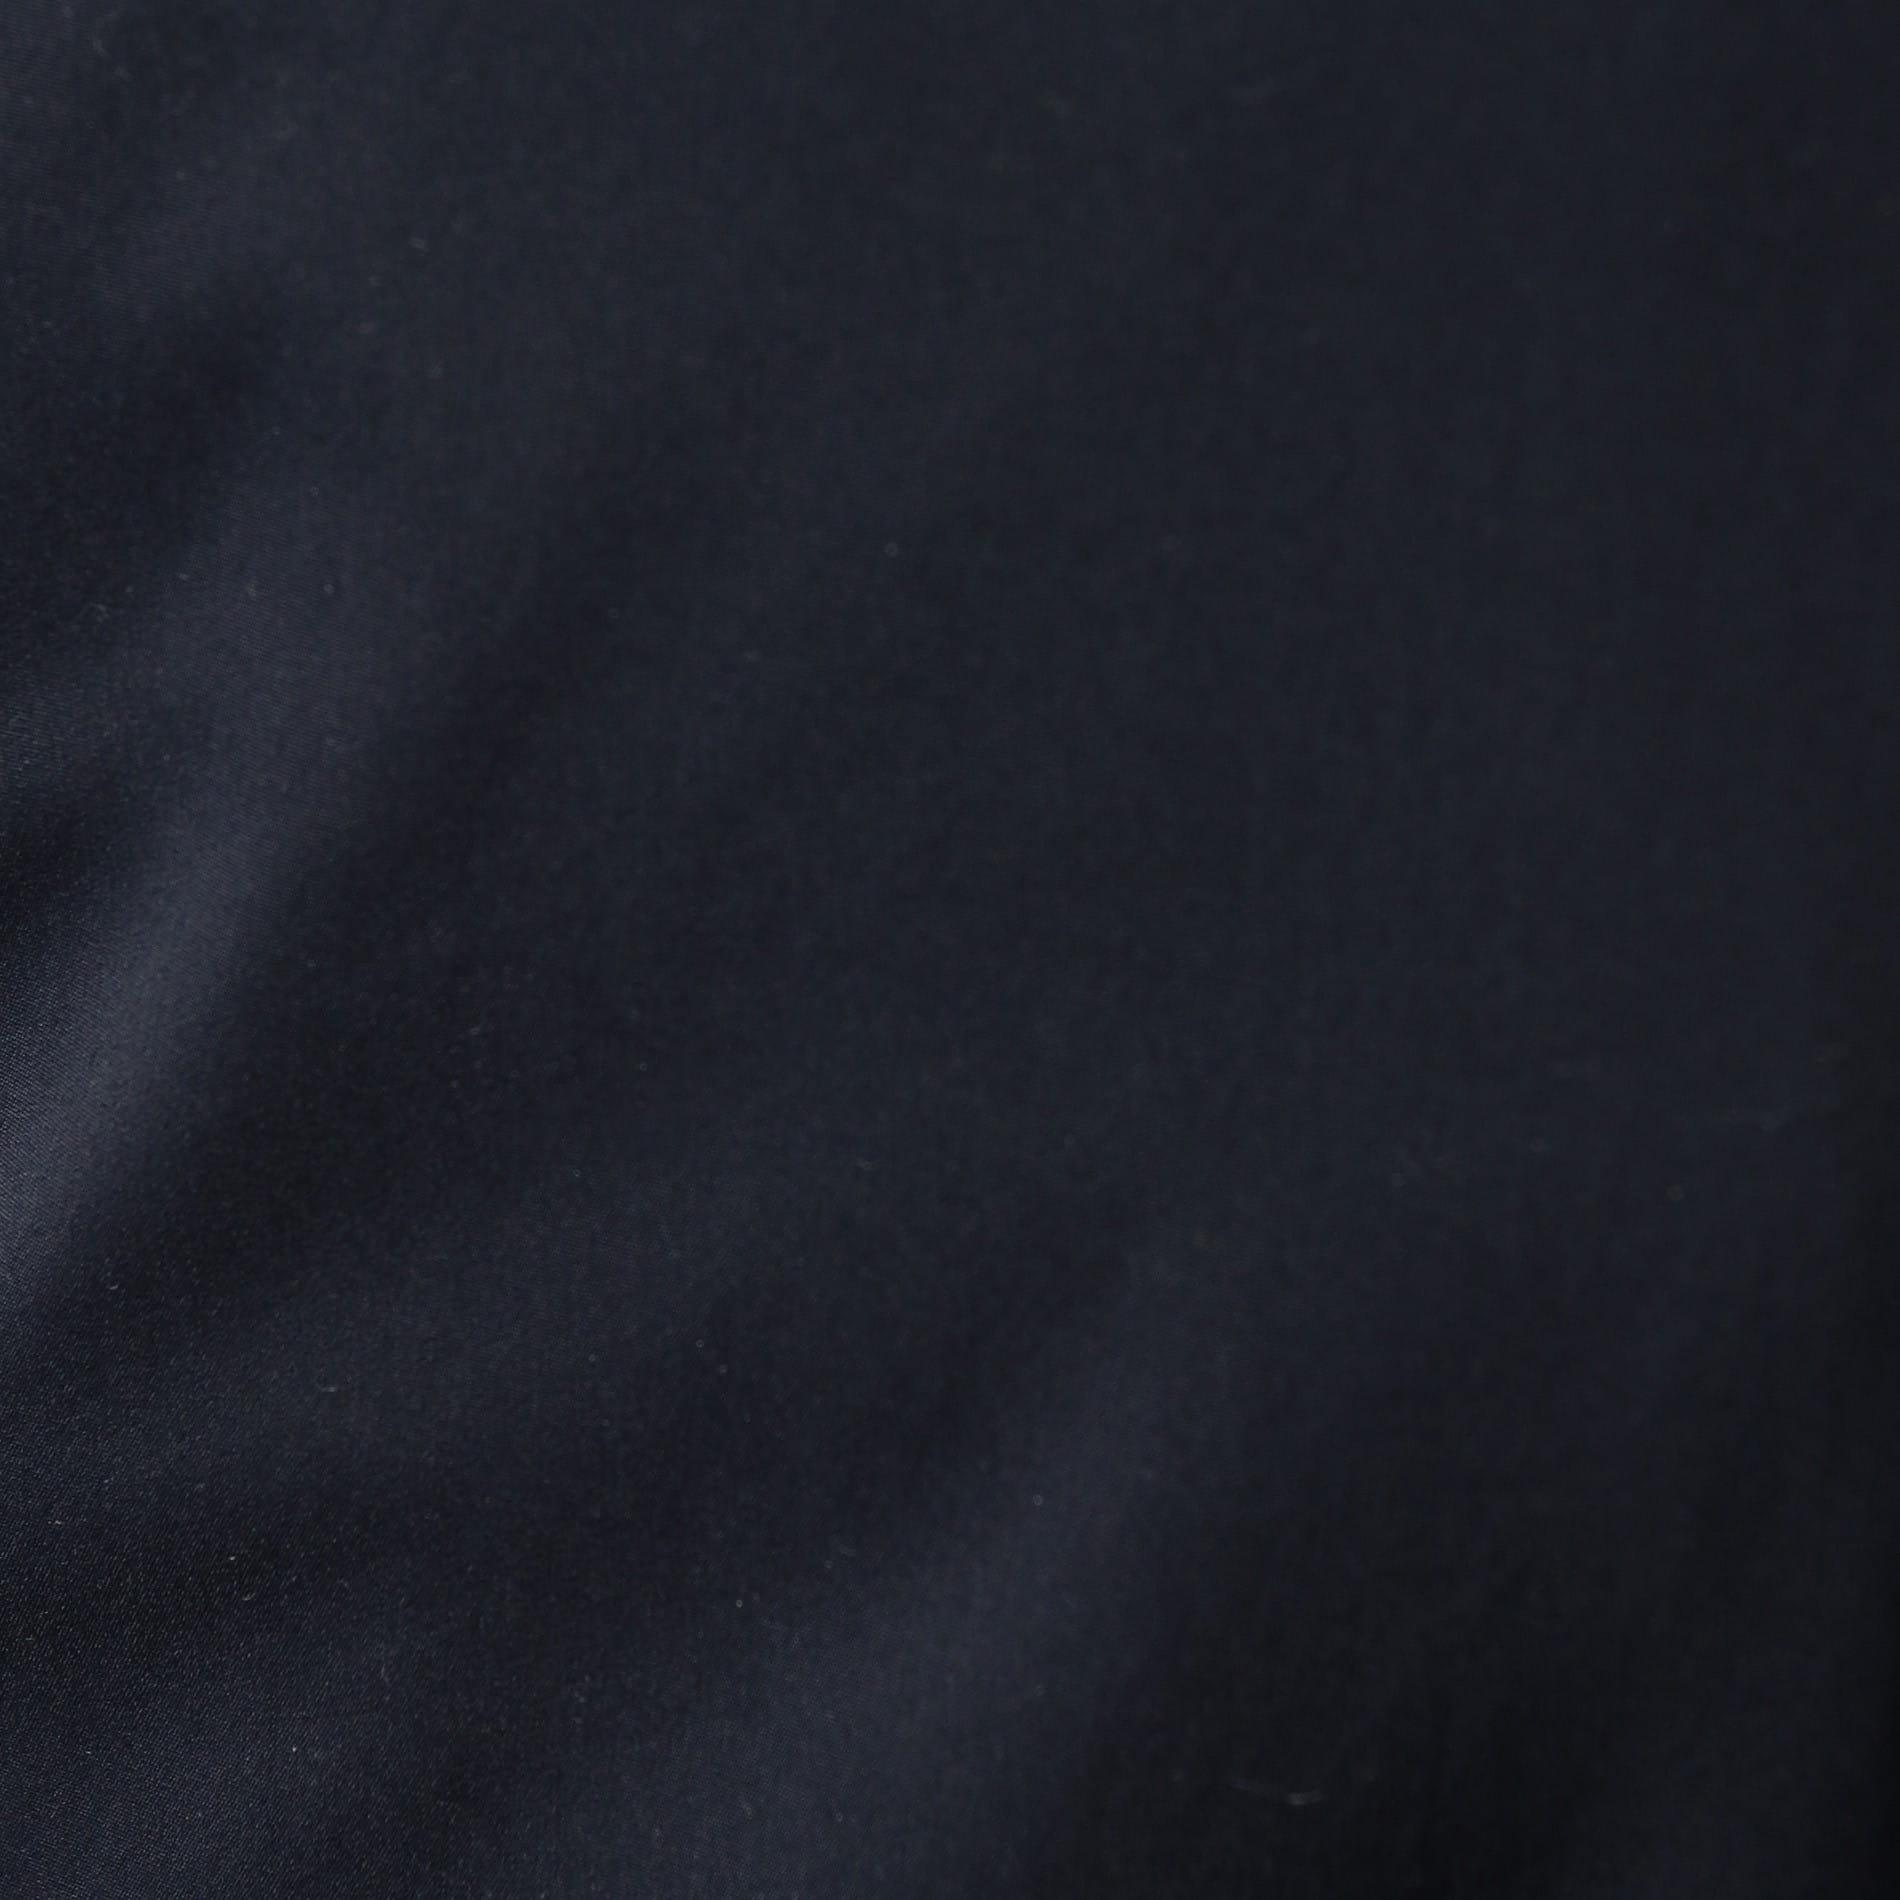 【GUILD PRIME】MEN ウォーターリぺレントパンツ